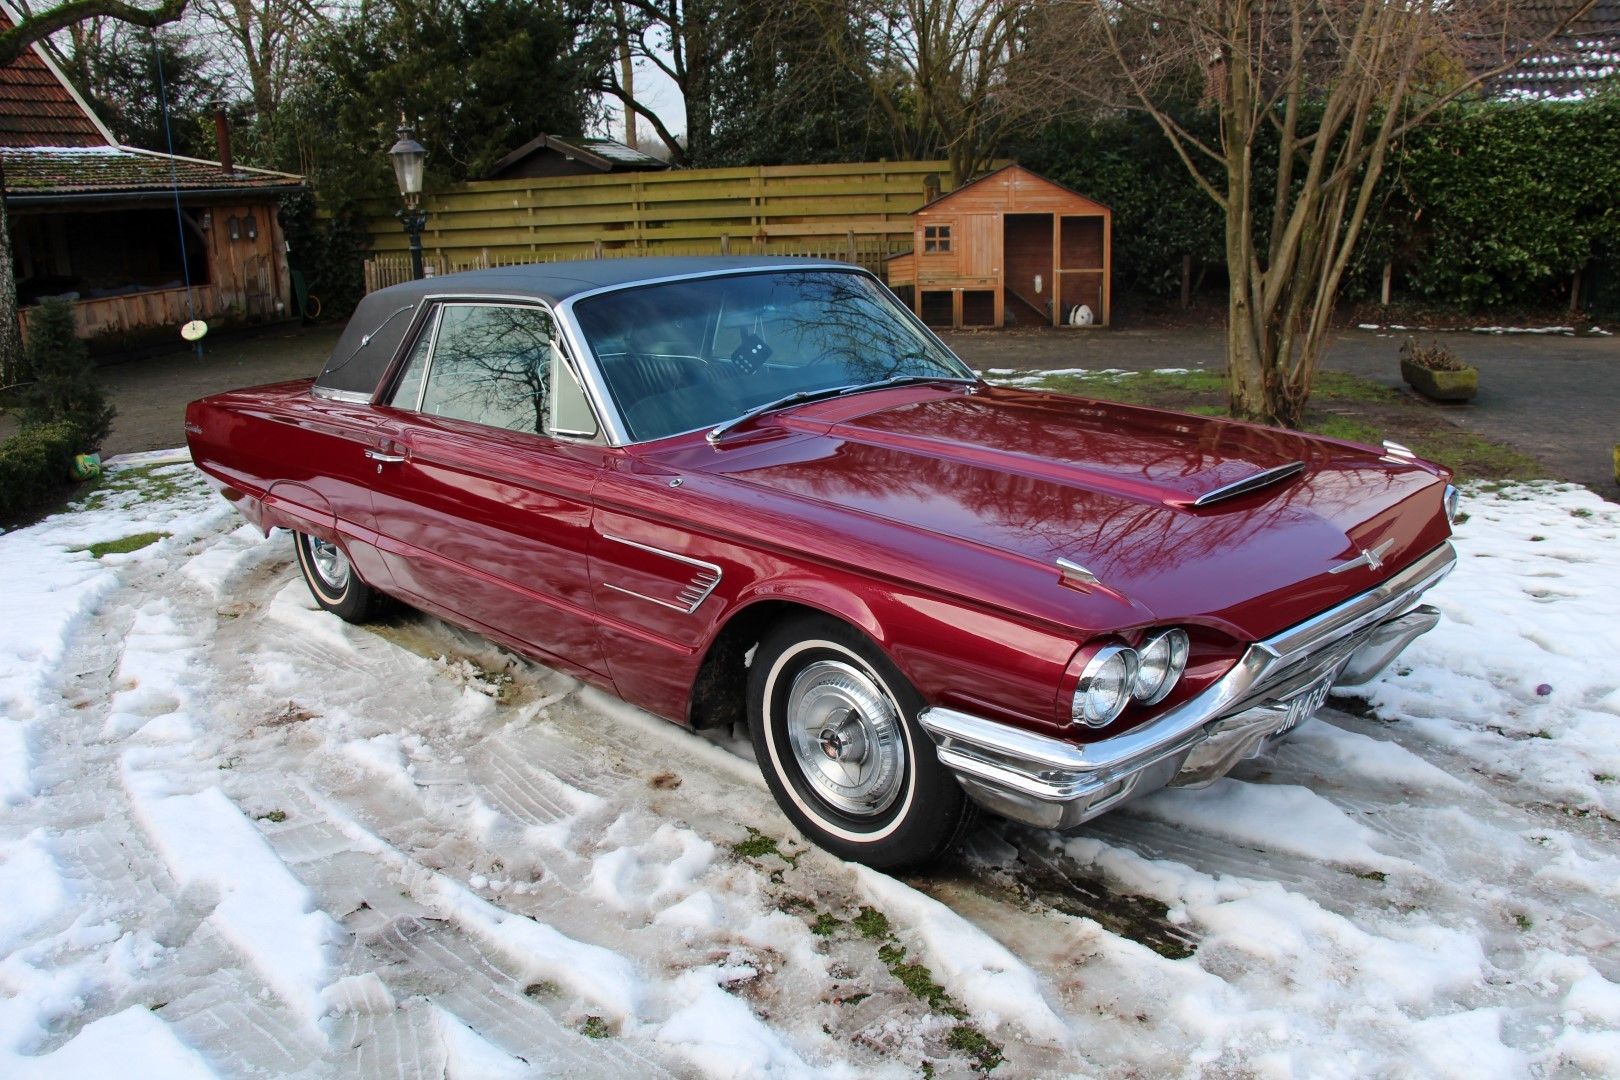 1965 Ford Thunderbird Hardtop - Burgundy new (16)